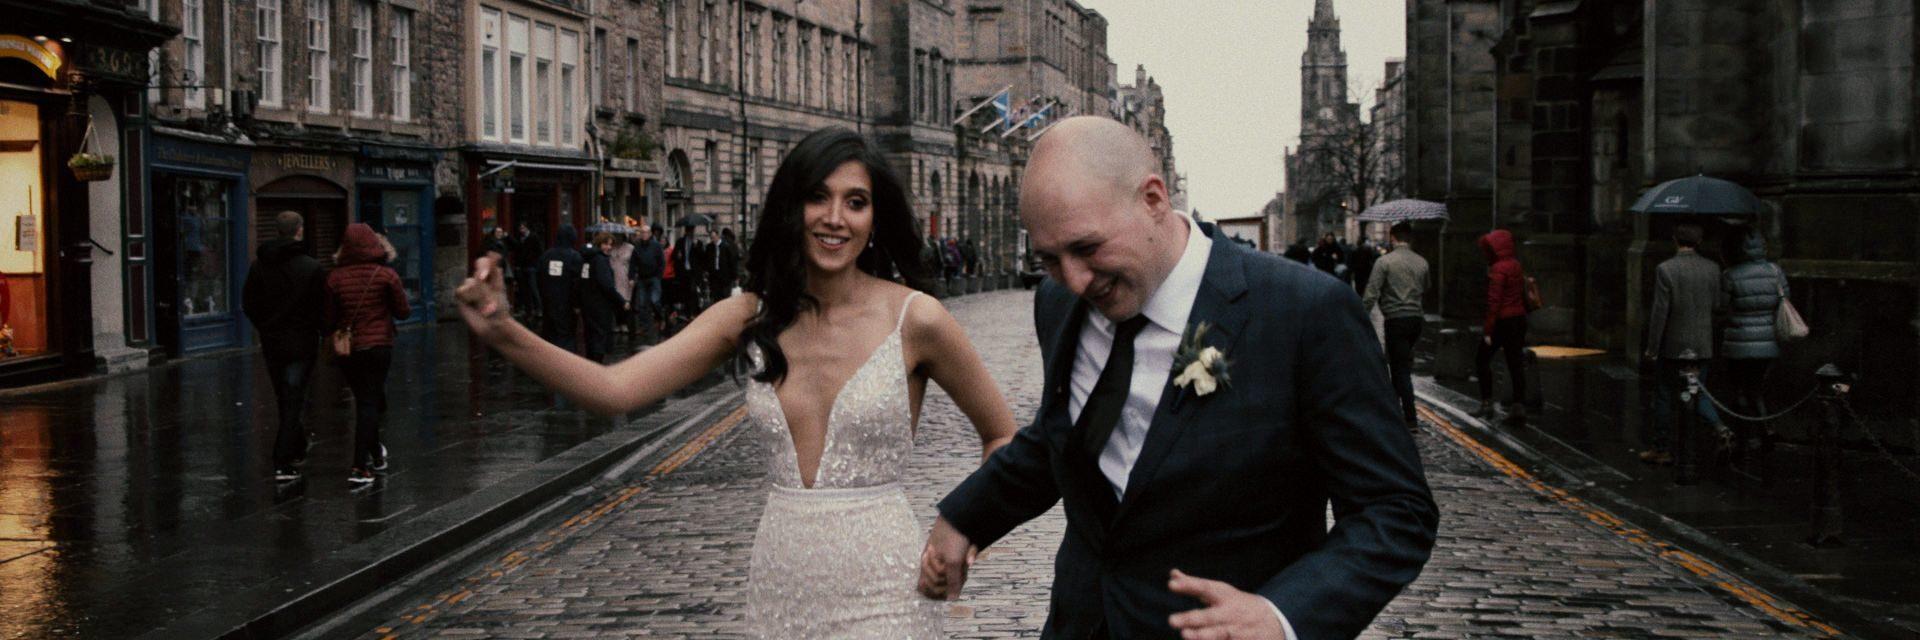 Sicily-wedding-videographer-cinemate-films-04